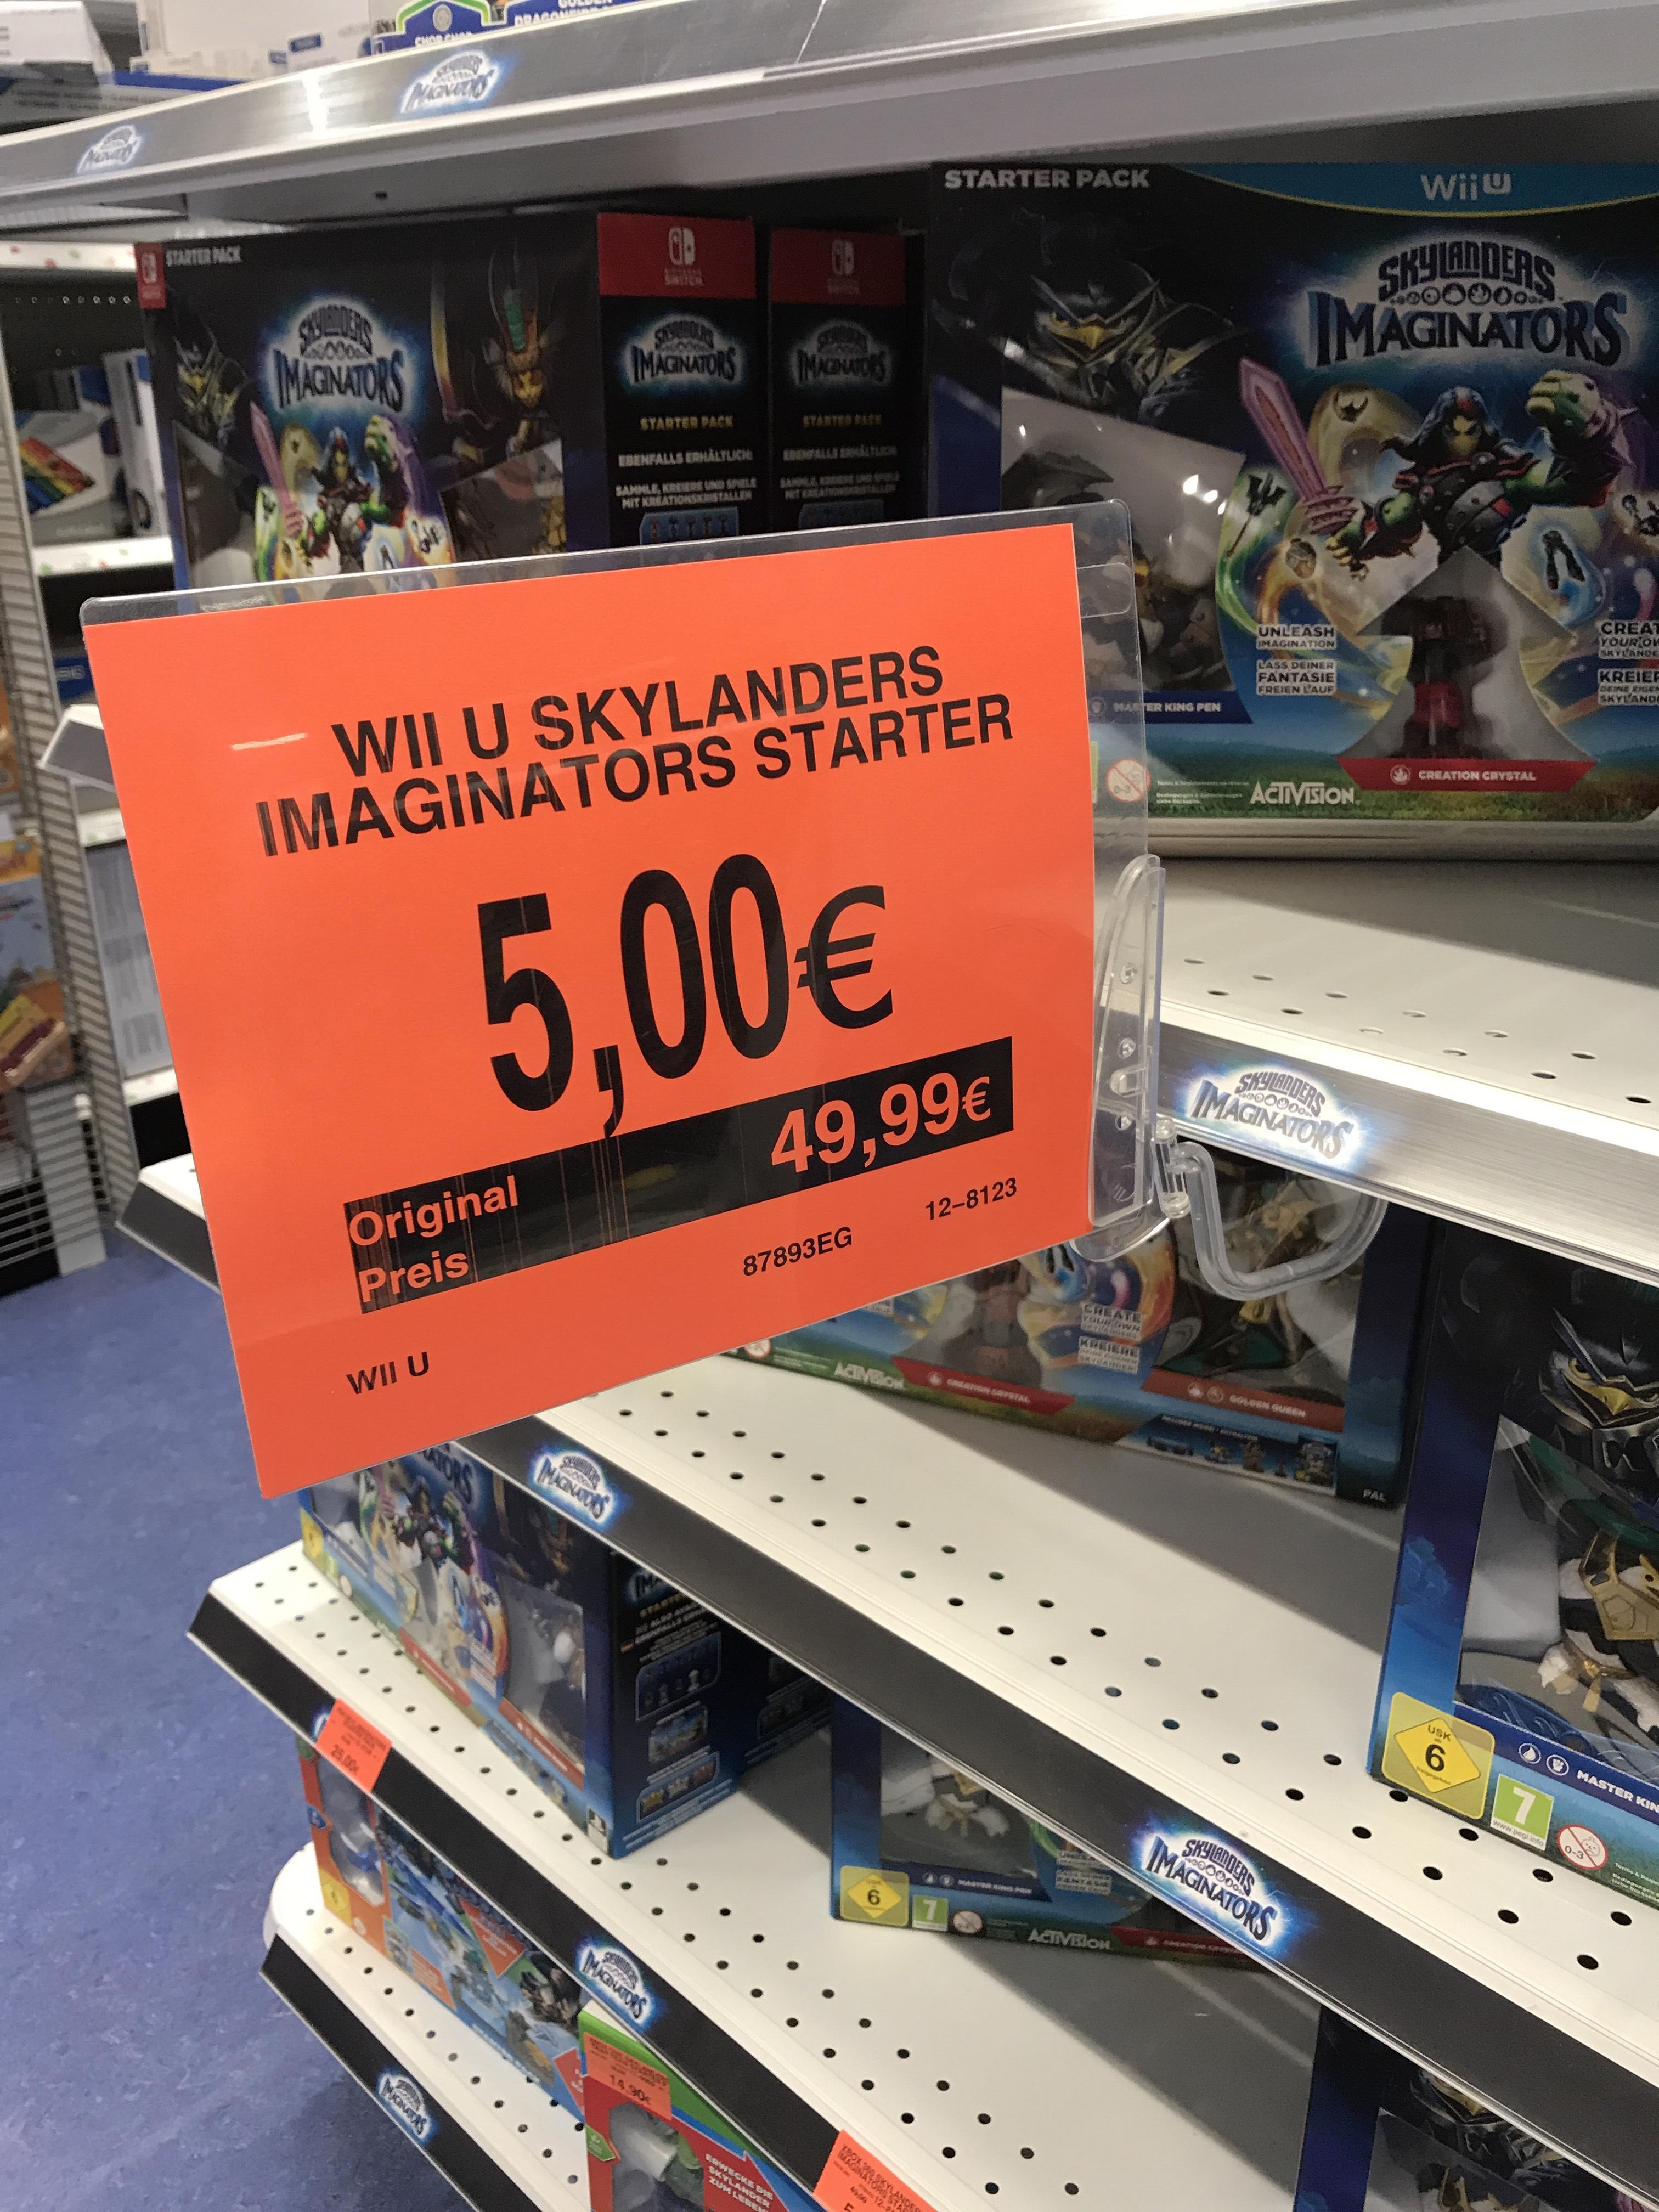 [local] ToysRus Rostock WII U Skylanders Imagninators Starter